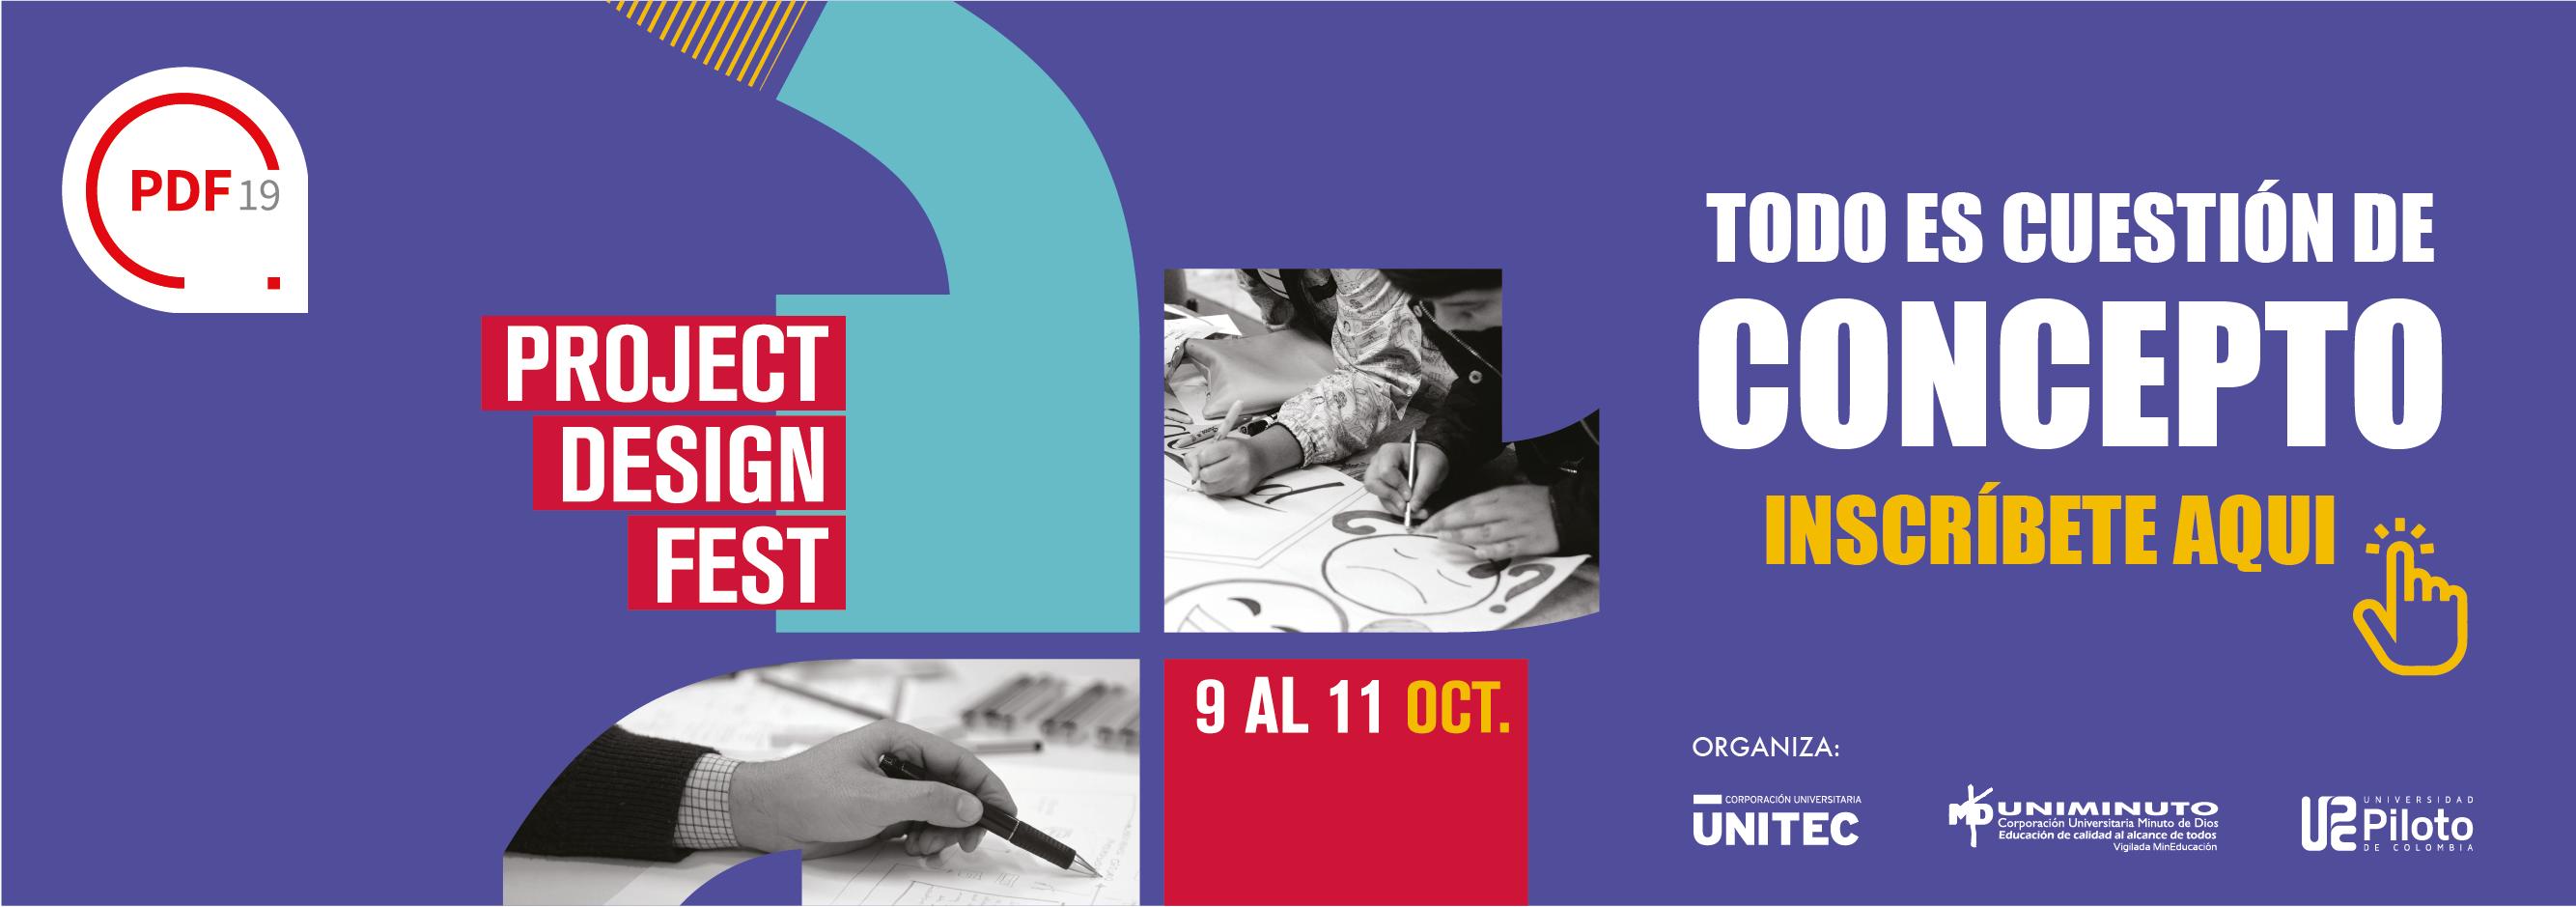 Calendario Financiero Uniminuto 2019 2.Home Unitec